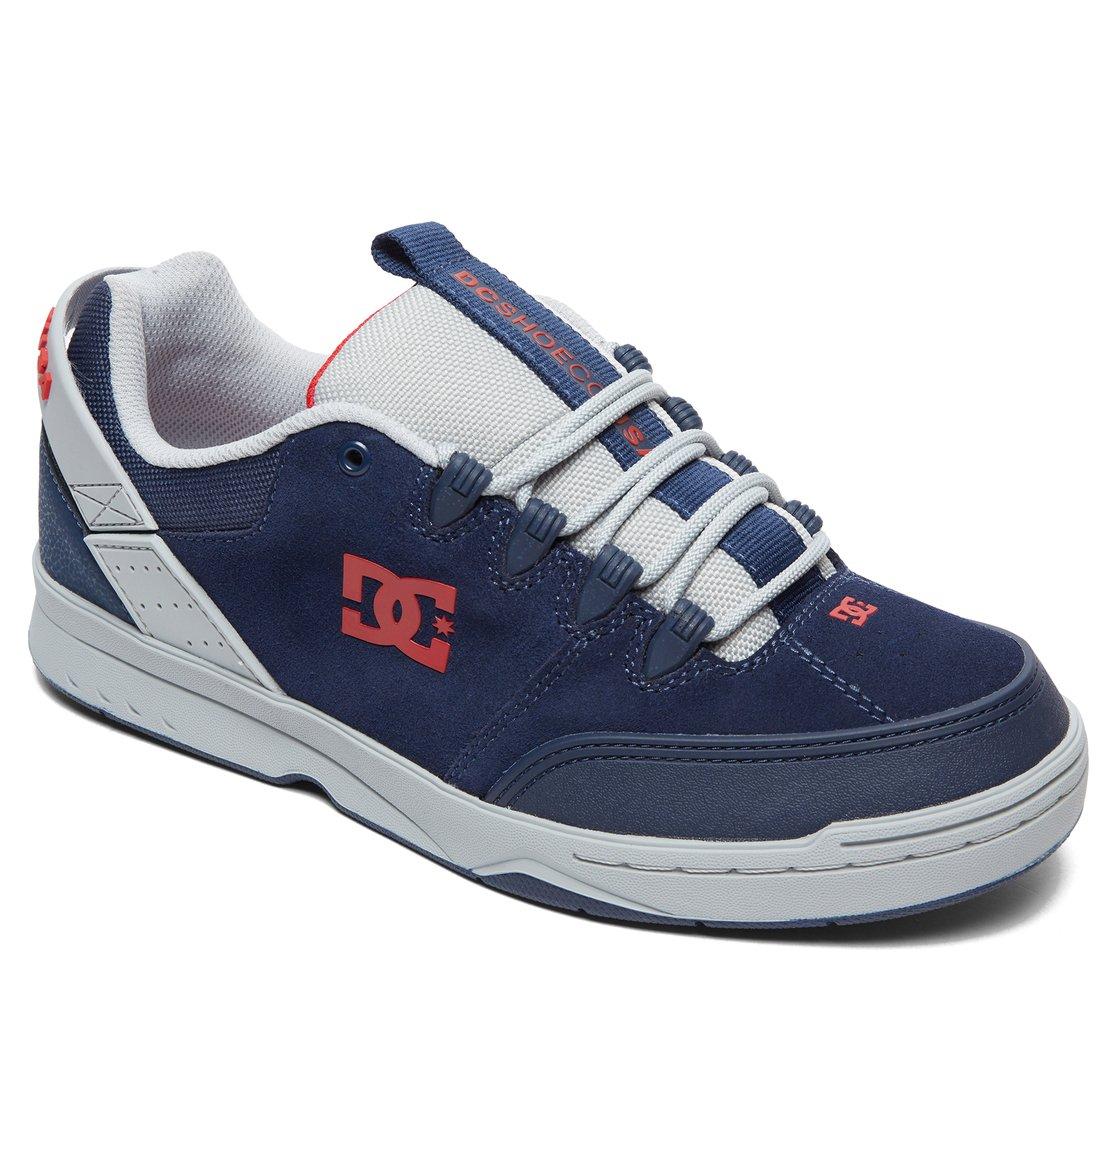 DC-Shoes-Syntax-Baskets-pour-Homme-ADYS300290 miniature 10